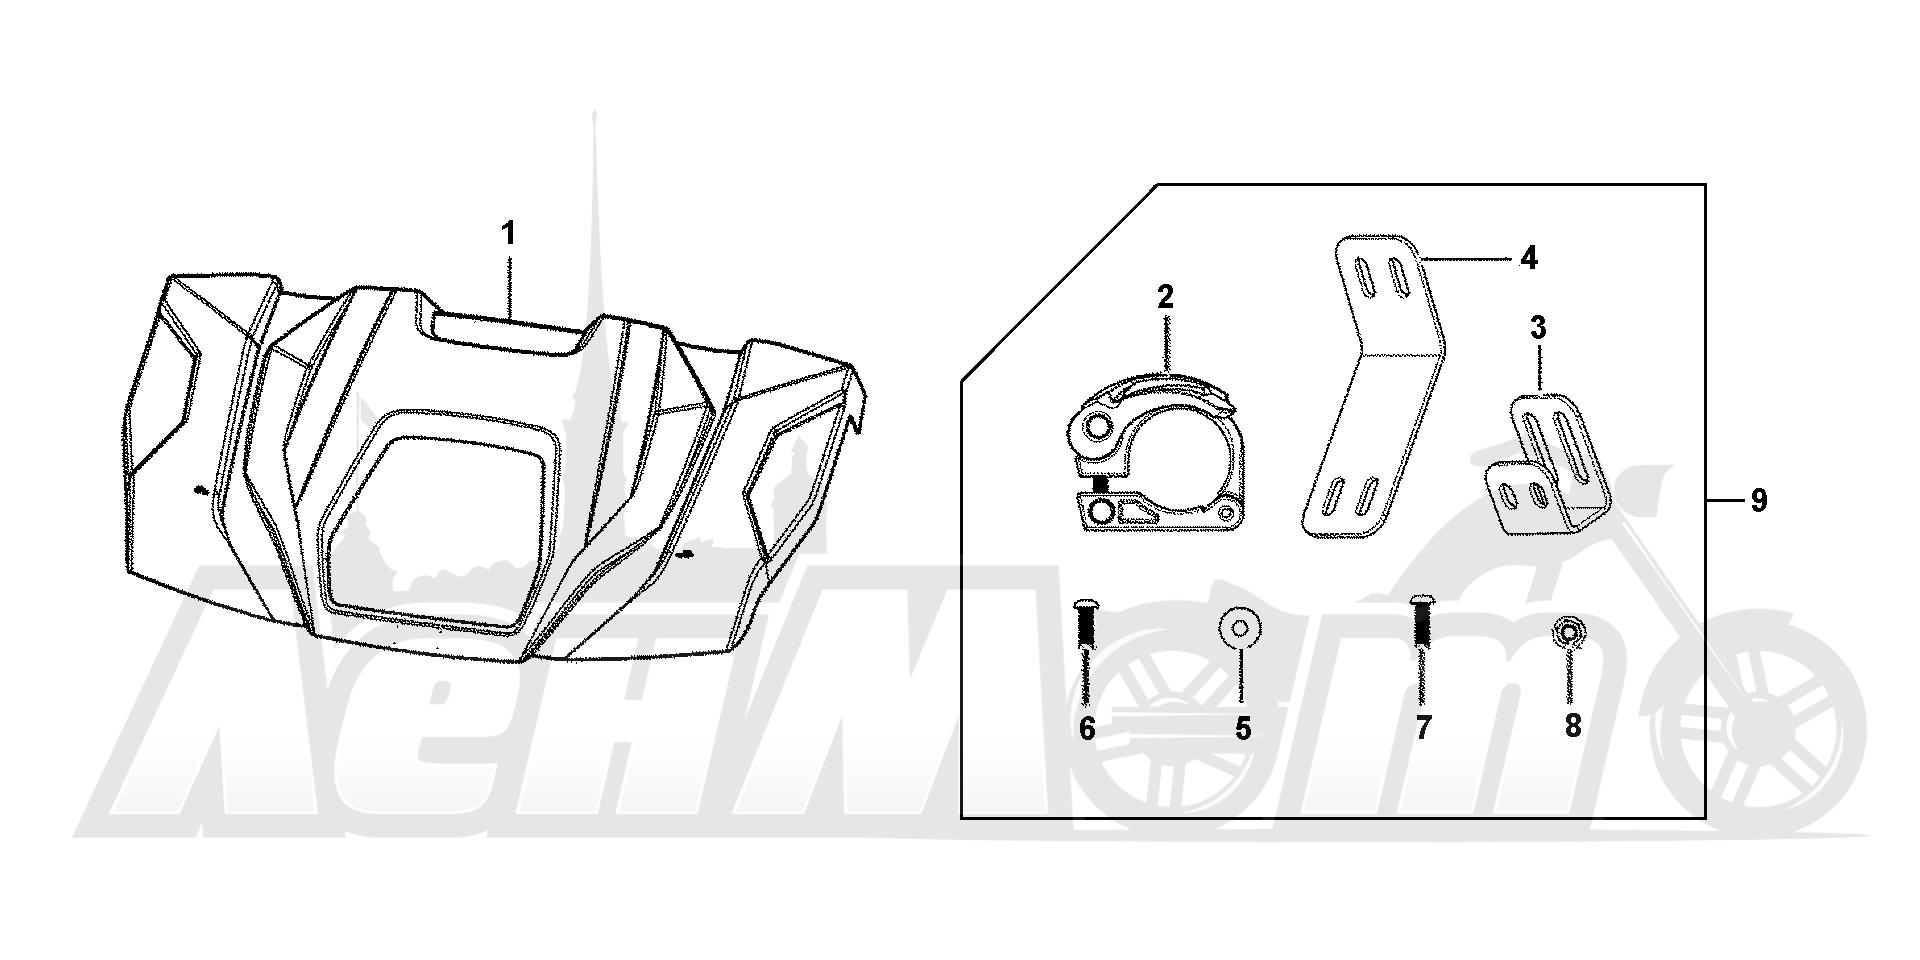 Запчасти для Квадроцикла Honda 2019 SXS1000M5P Раздел: HARD ROOF (3P) | HARD крыша (3P)